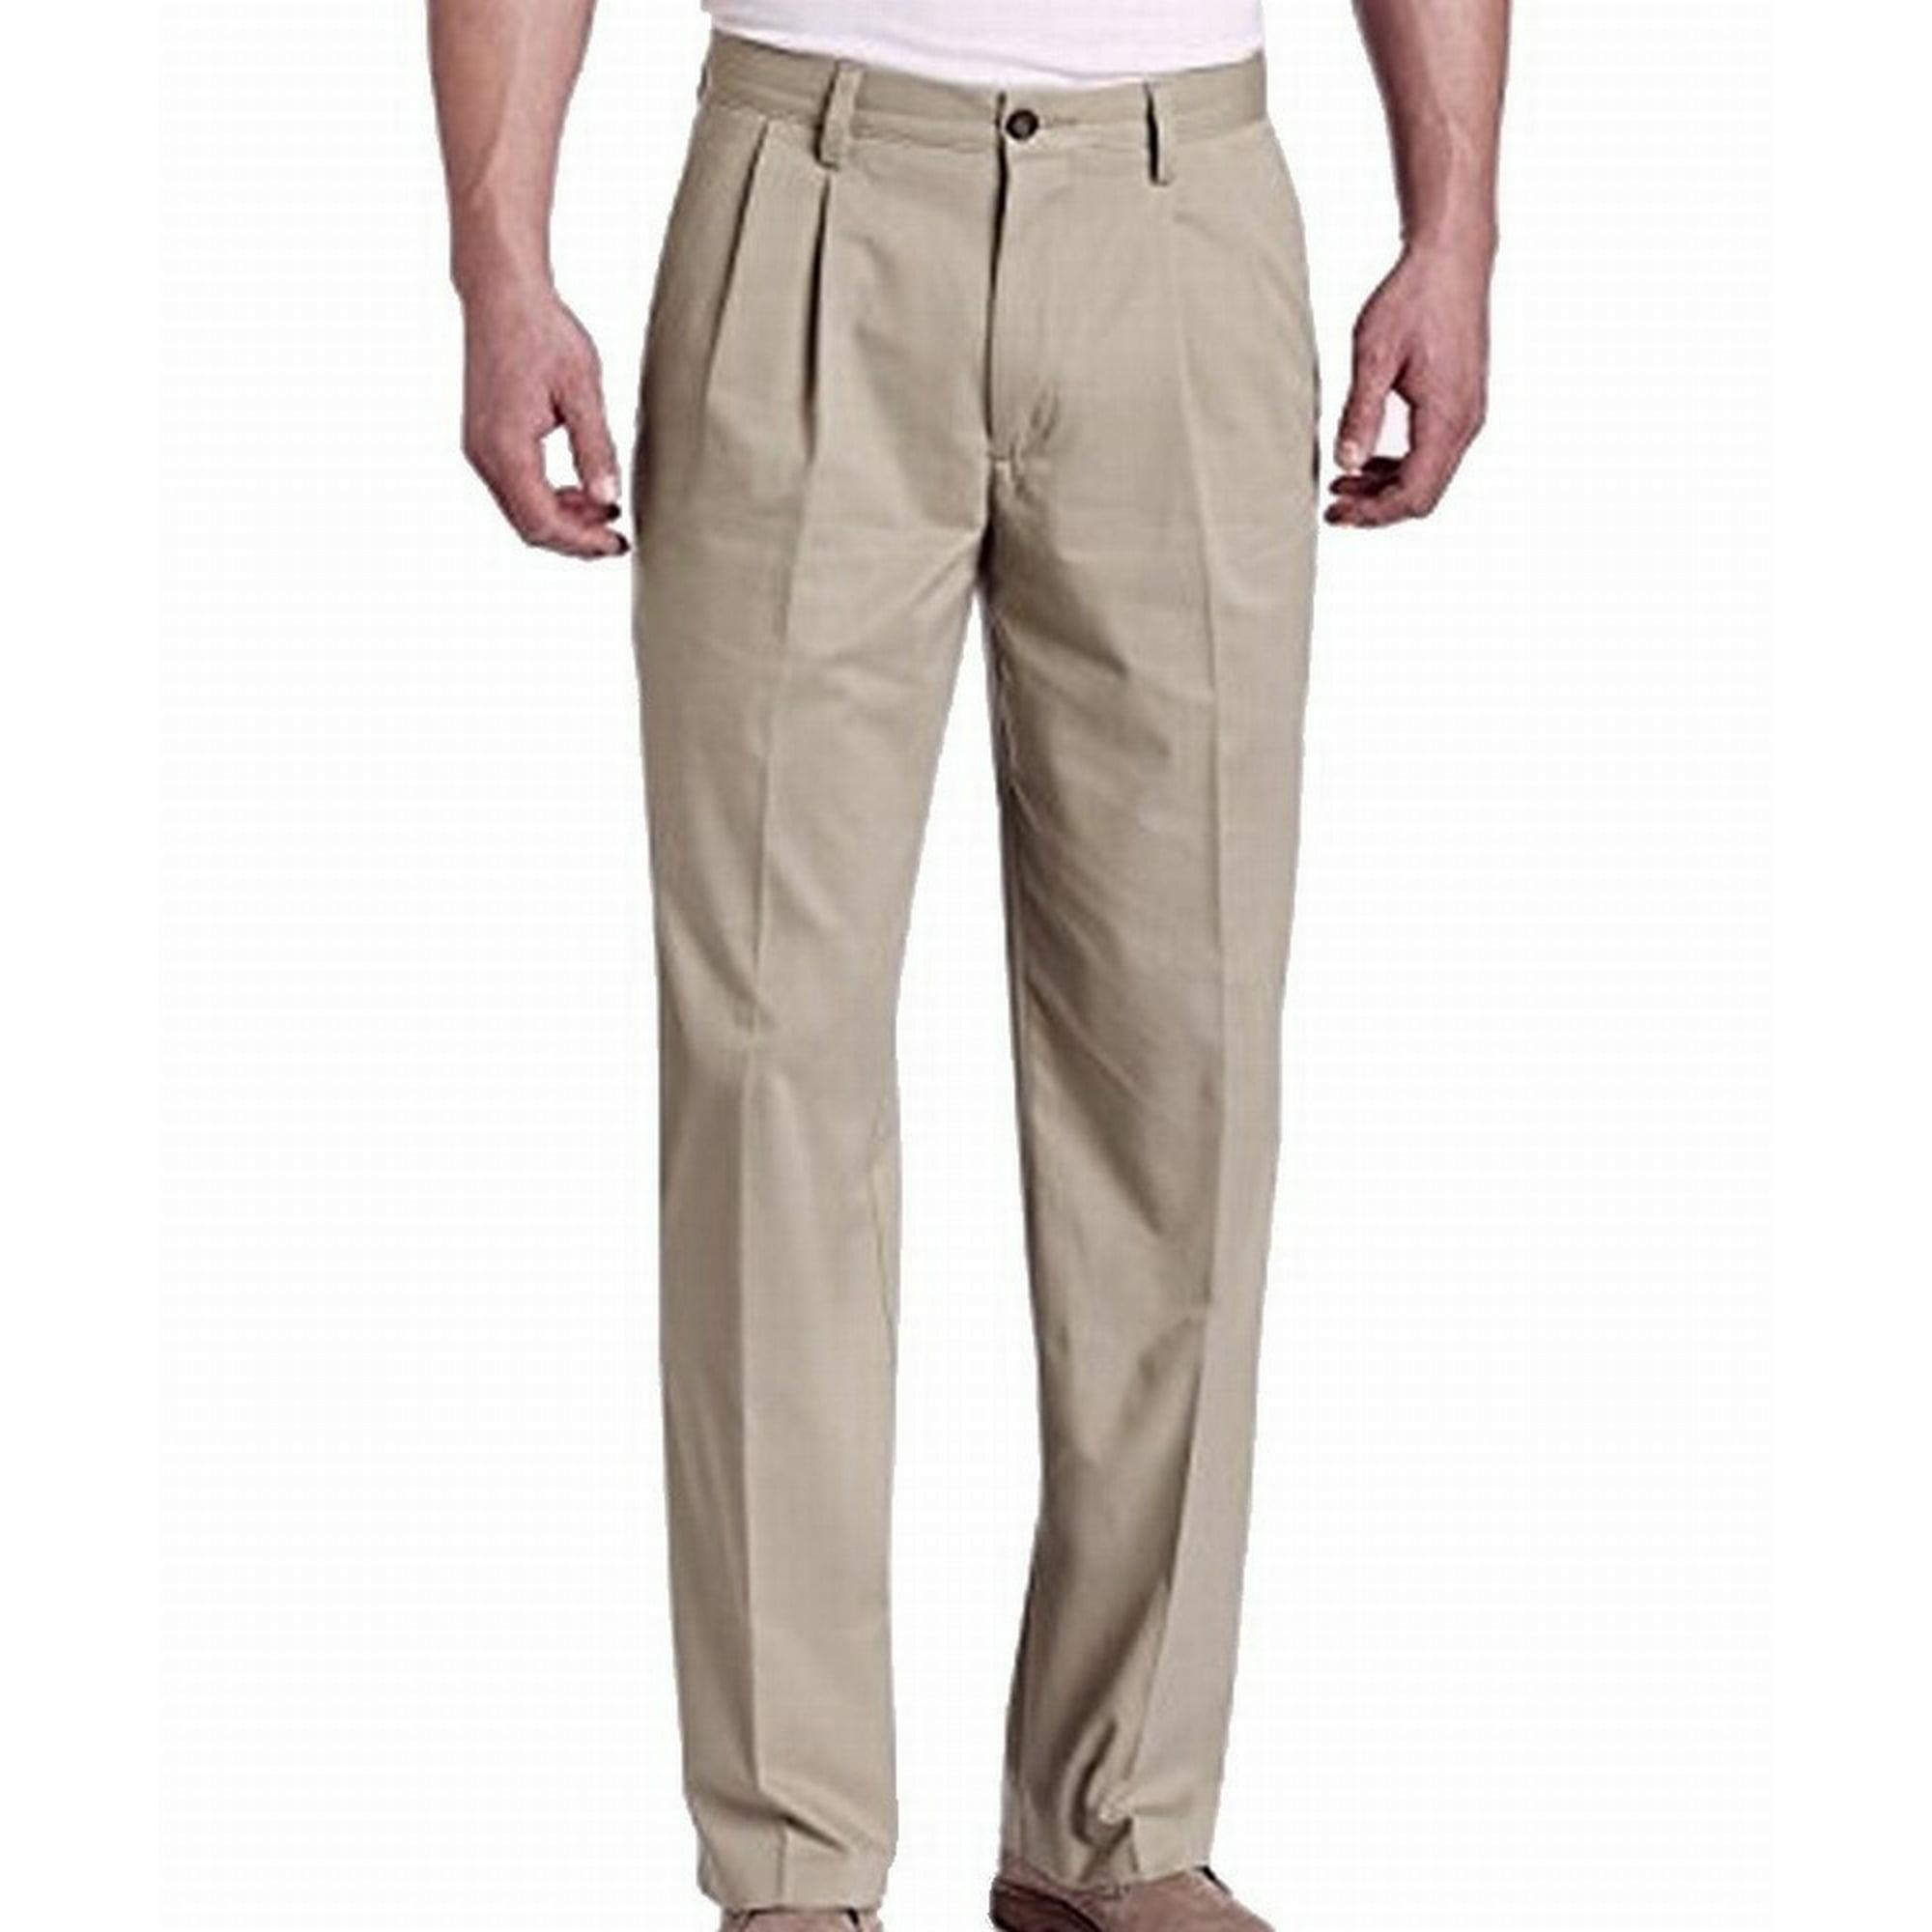 9c3e5b6812 Buy Dockers NEW Beige Mens Size 34X34 Khakis Double Pleated Dress D3 ...